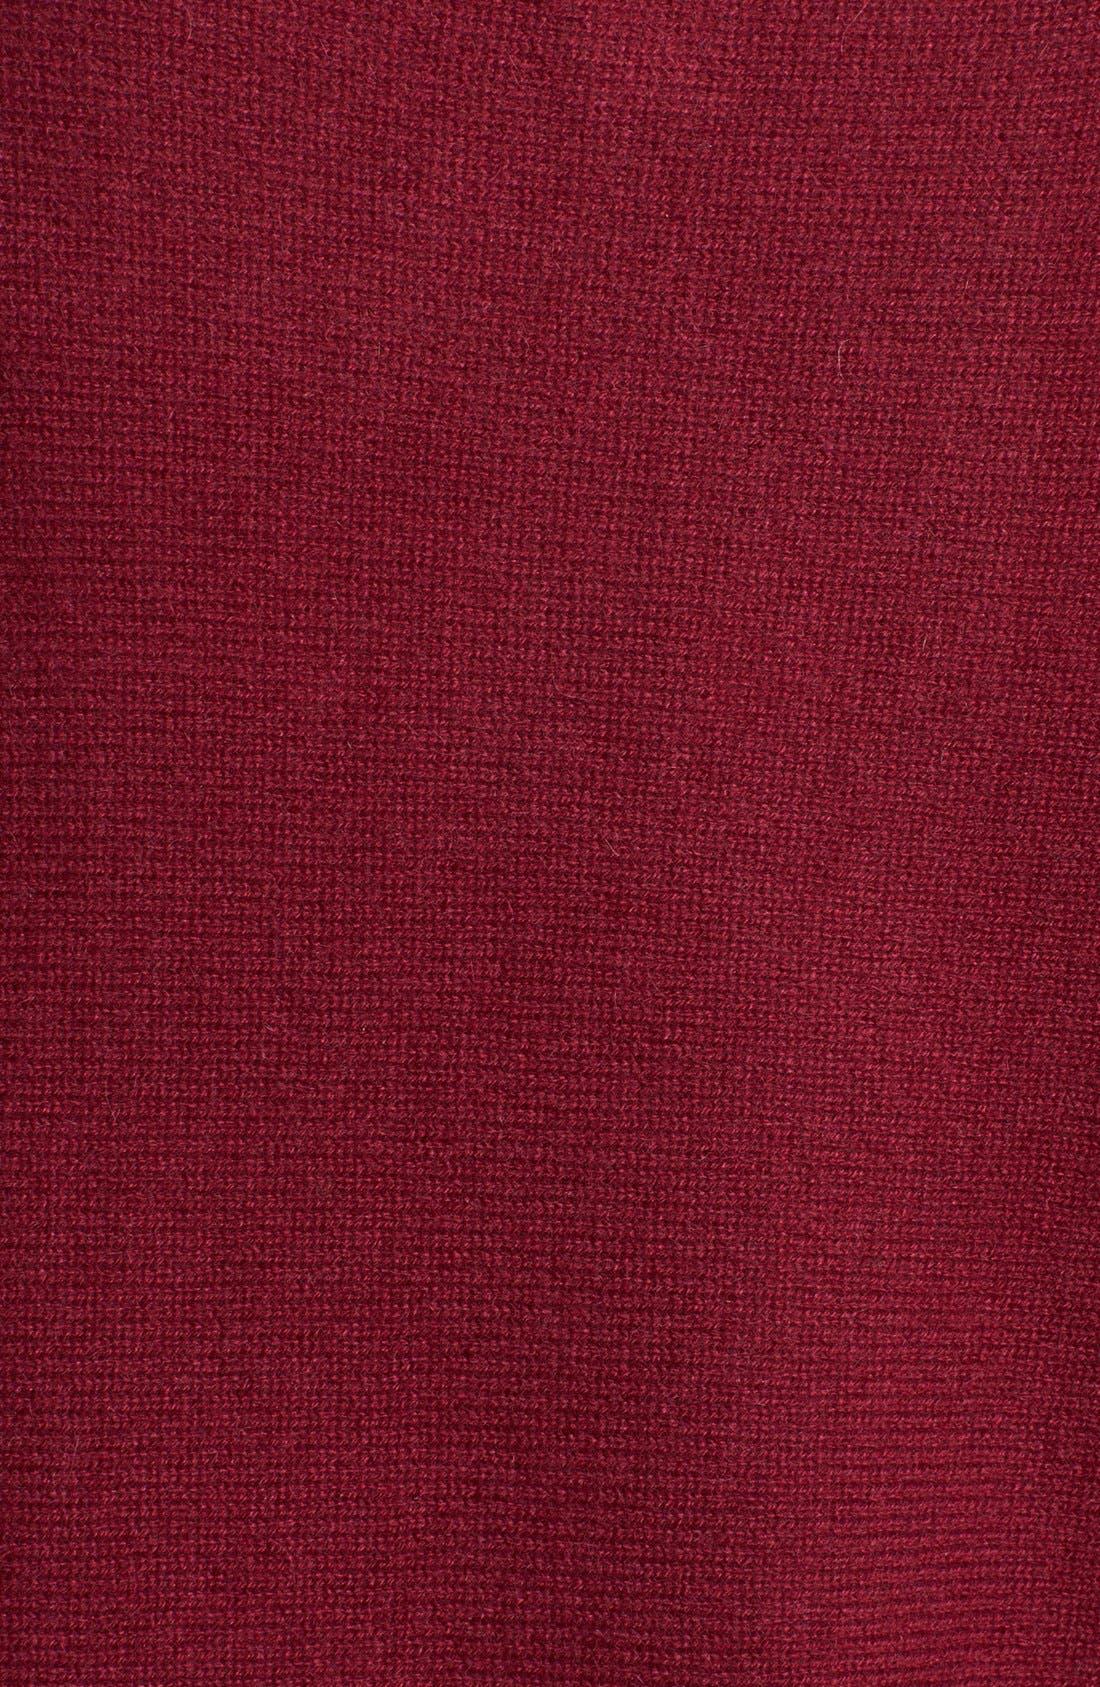 Alternate Image 3  - White + Warren V-Neck Cashmere Sweater